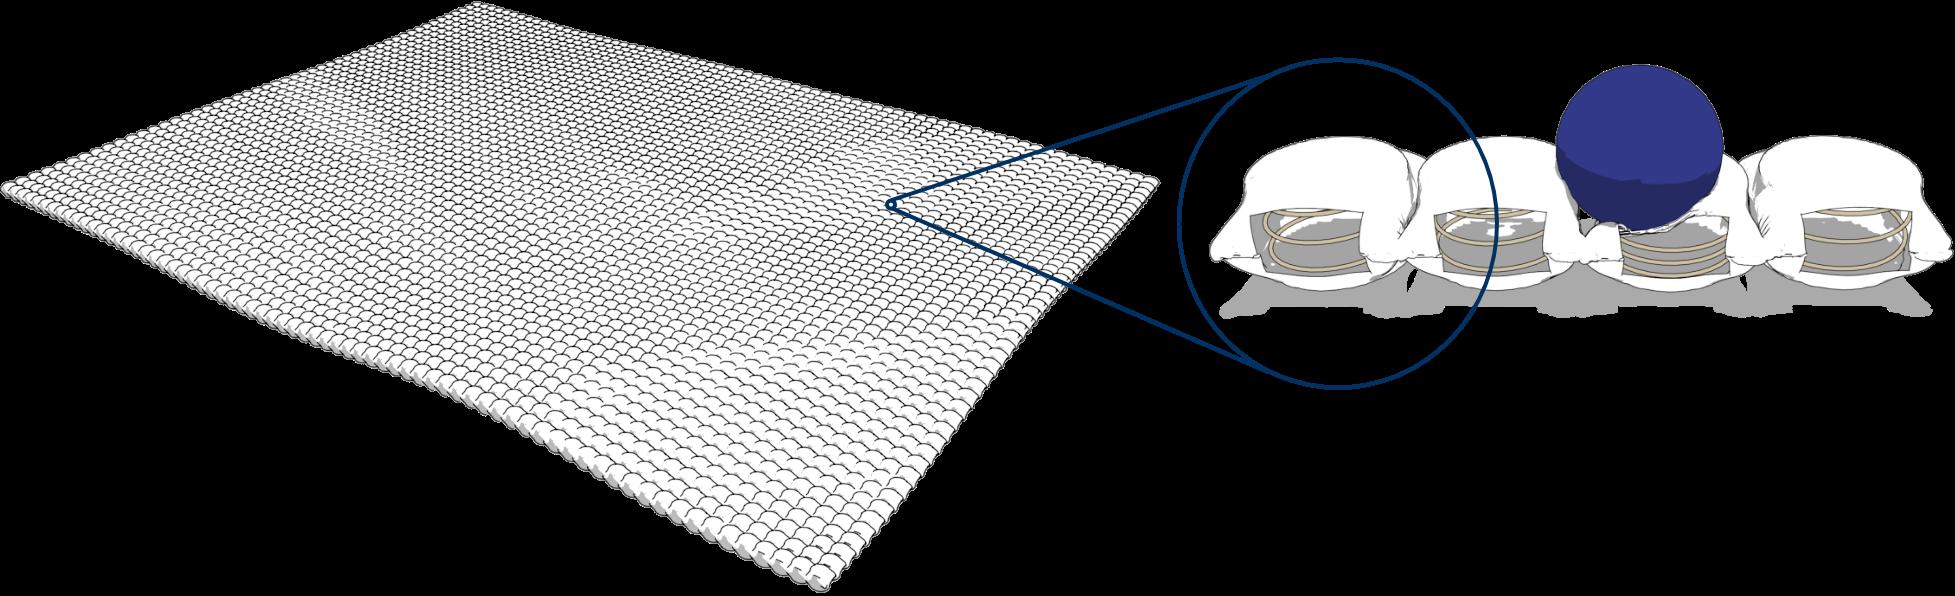 micro-pocket-springs-illustration